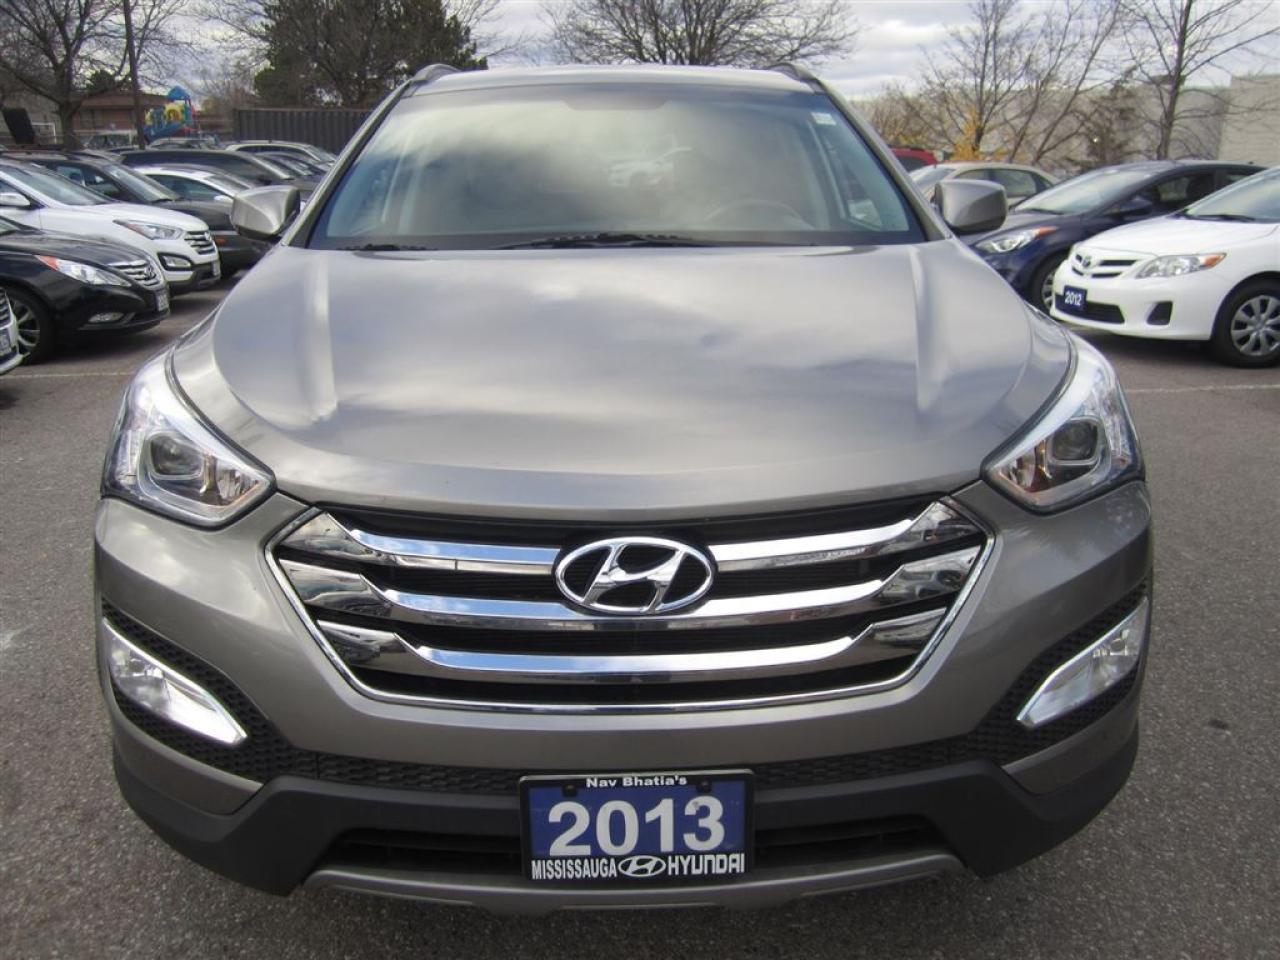 2013 Hyundai Santa Fe One owner-FWD-Premium-MINT